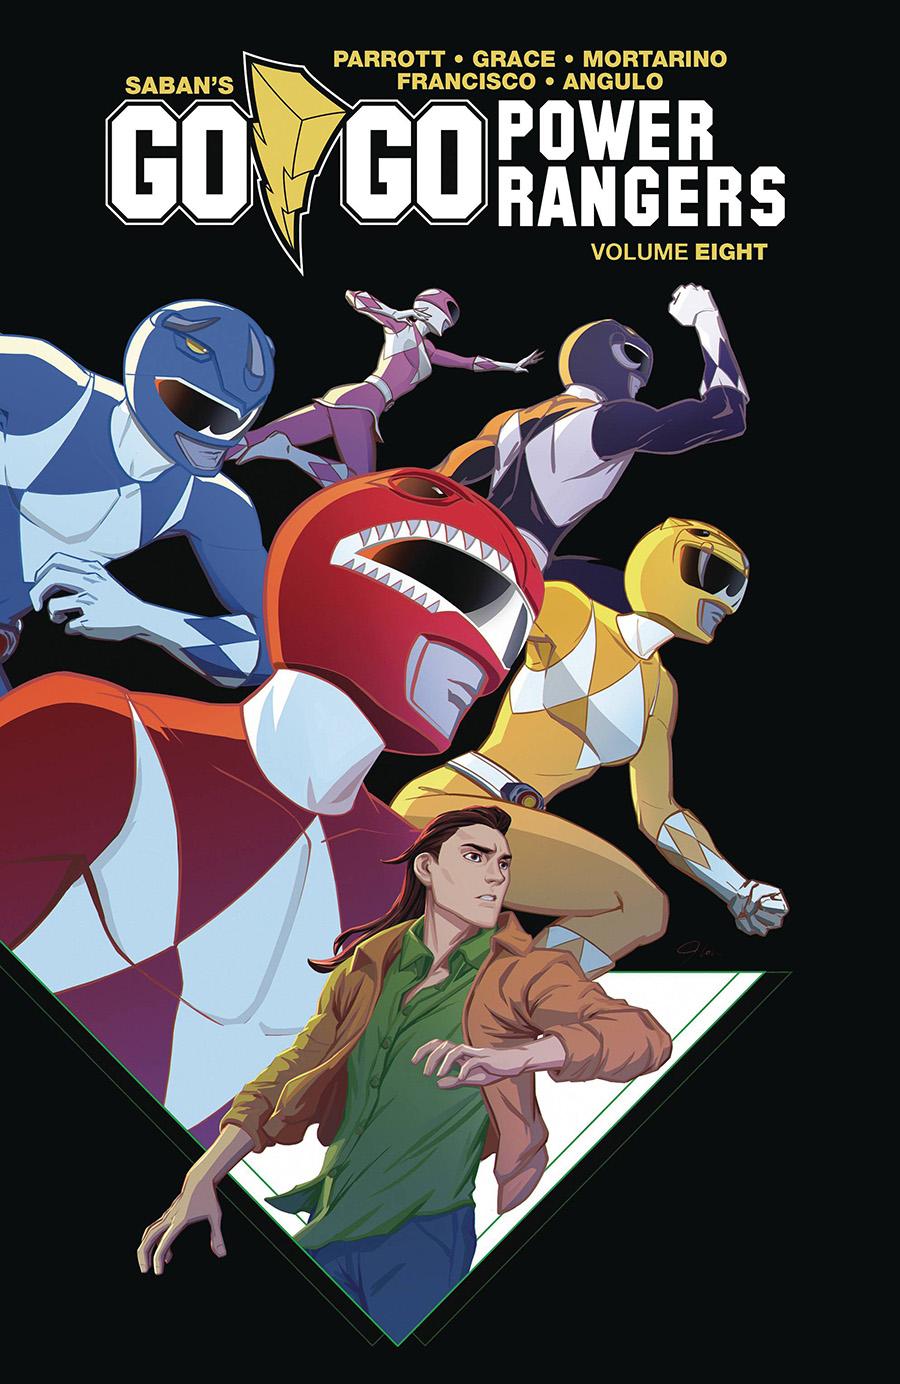 Sabans Go Go Power Rangers Vol 8 TP